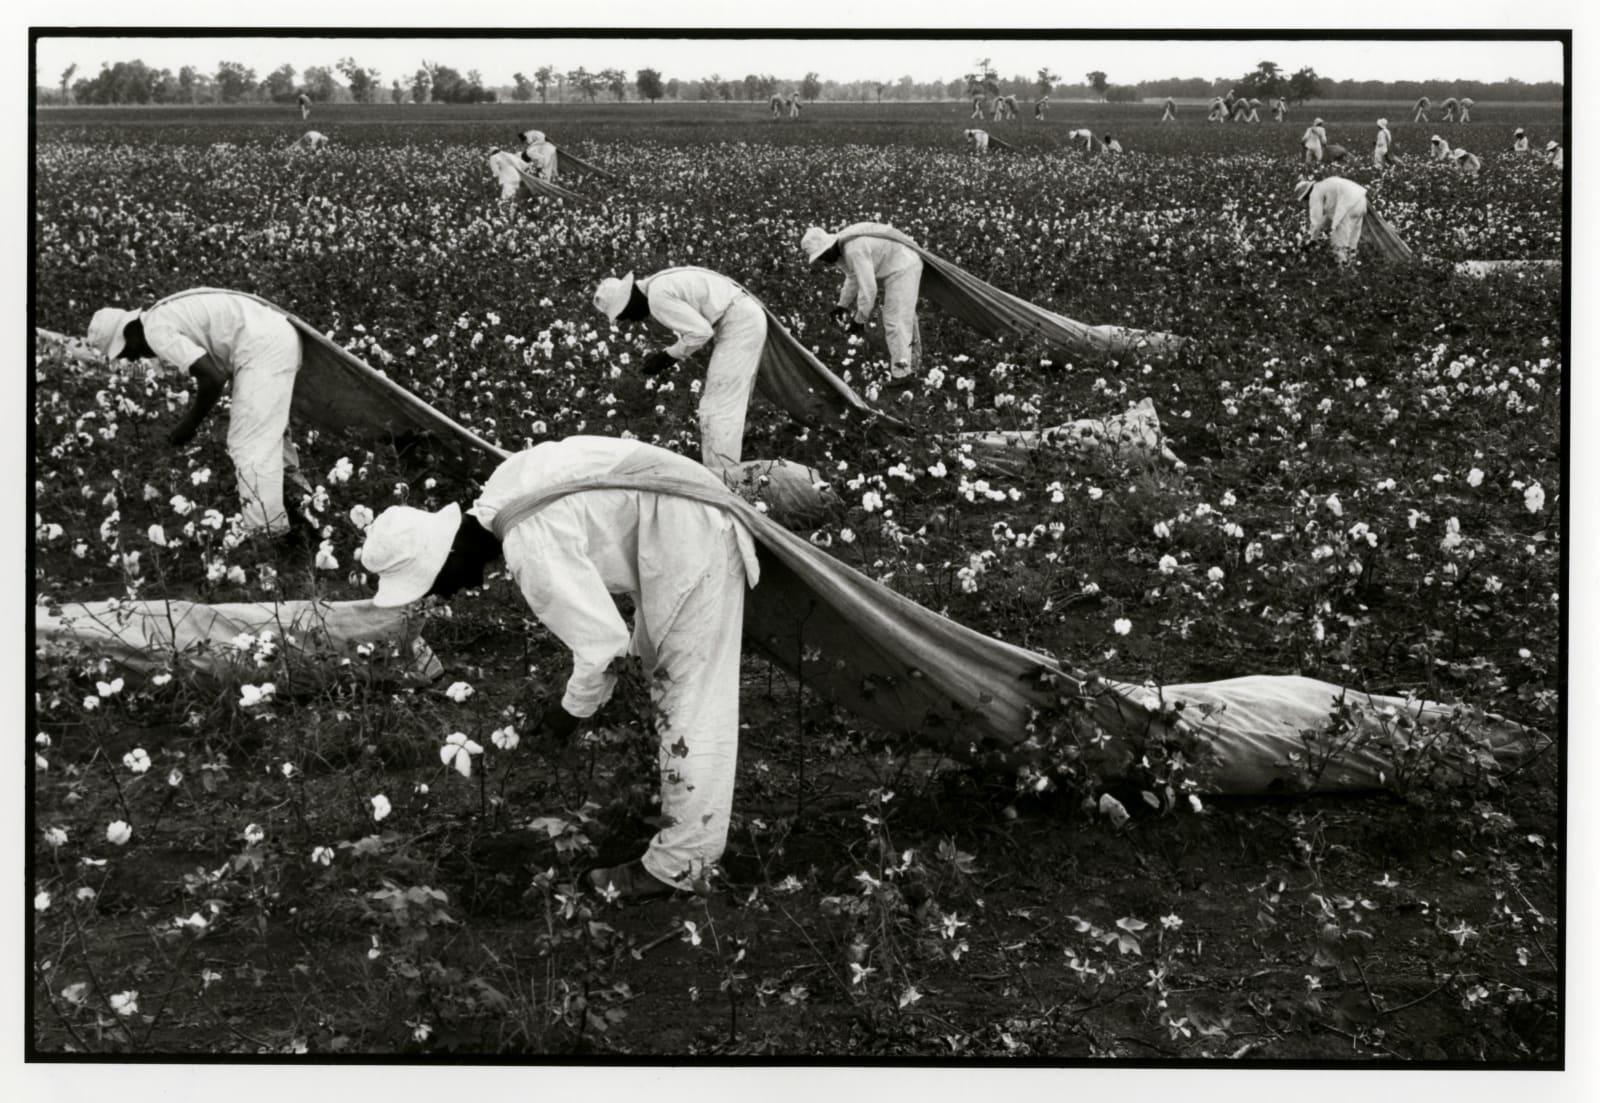 Danny Lyon - The Cotton Pickers, Ferguson Unit Texas Department Of Corrections, 1968